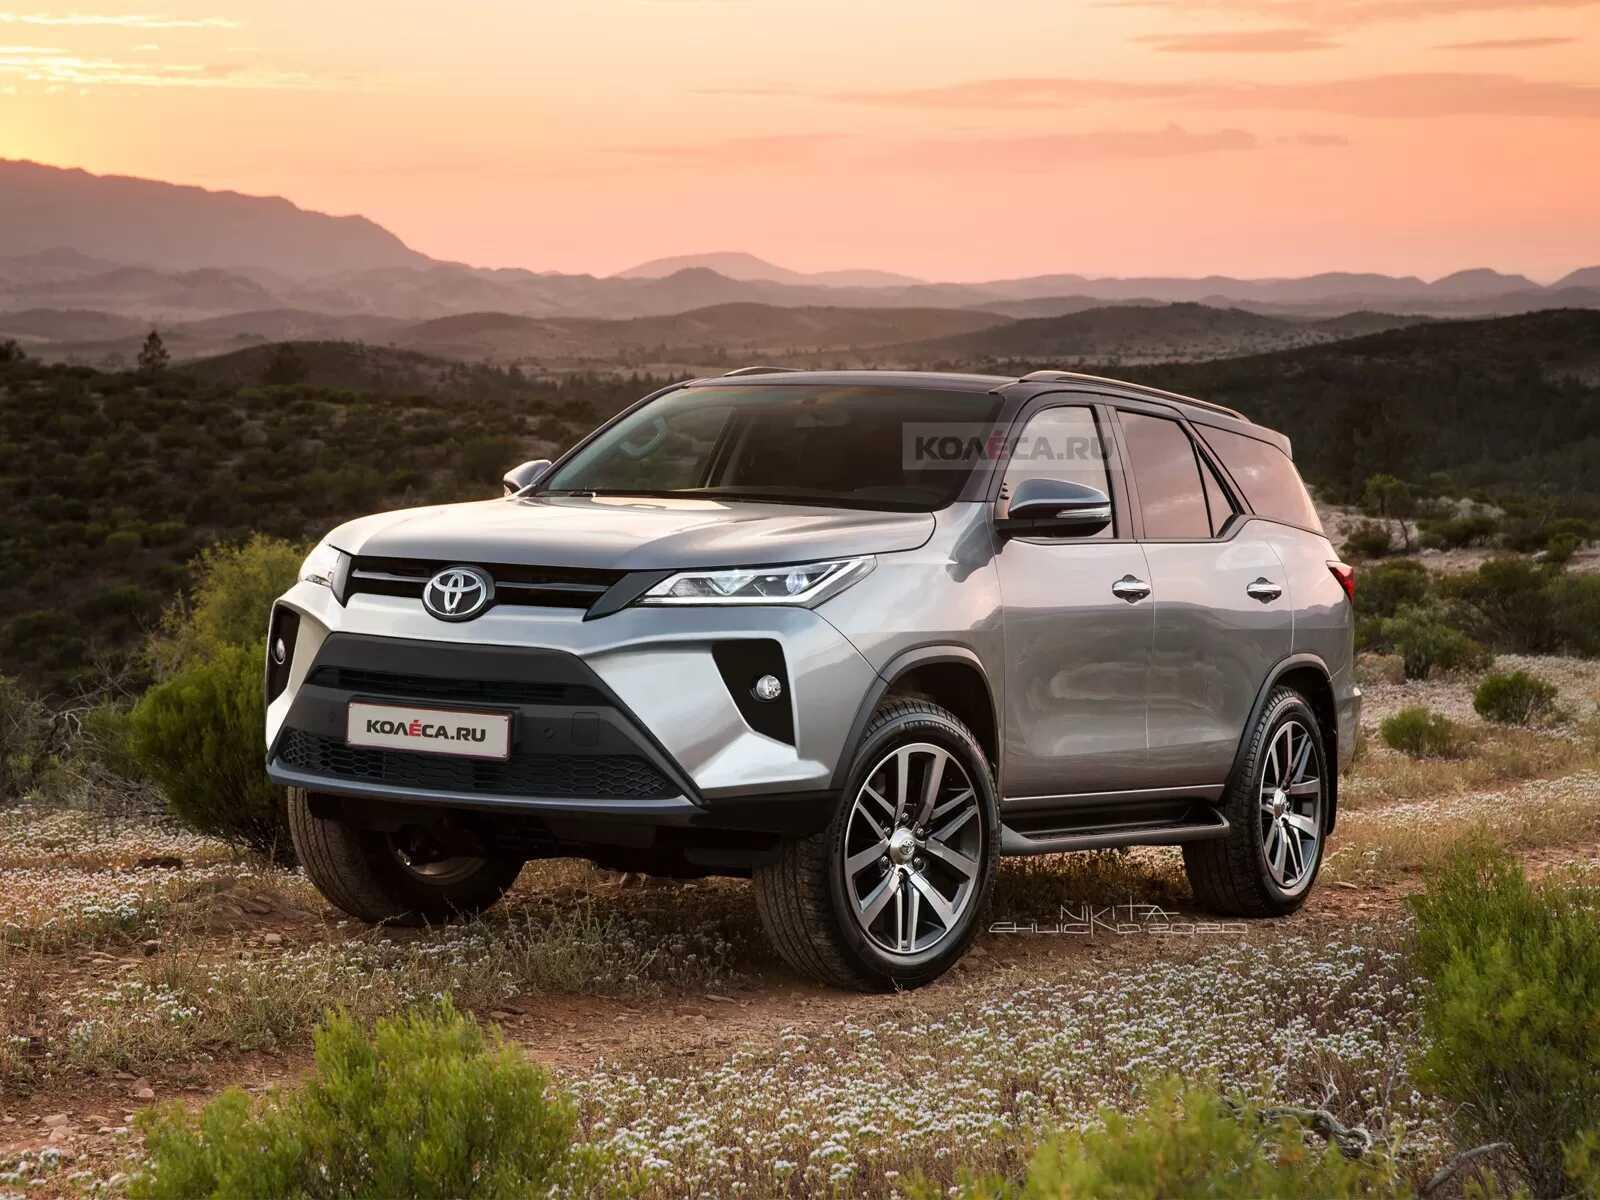 Speculative Renderings: 2020 Toyota Fortuner Facelift 1